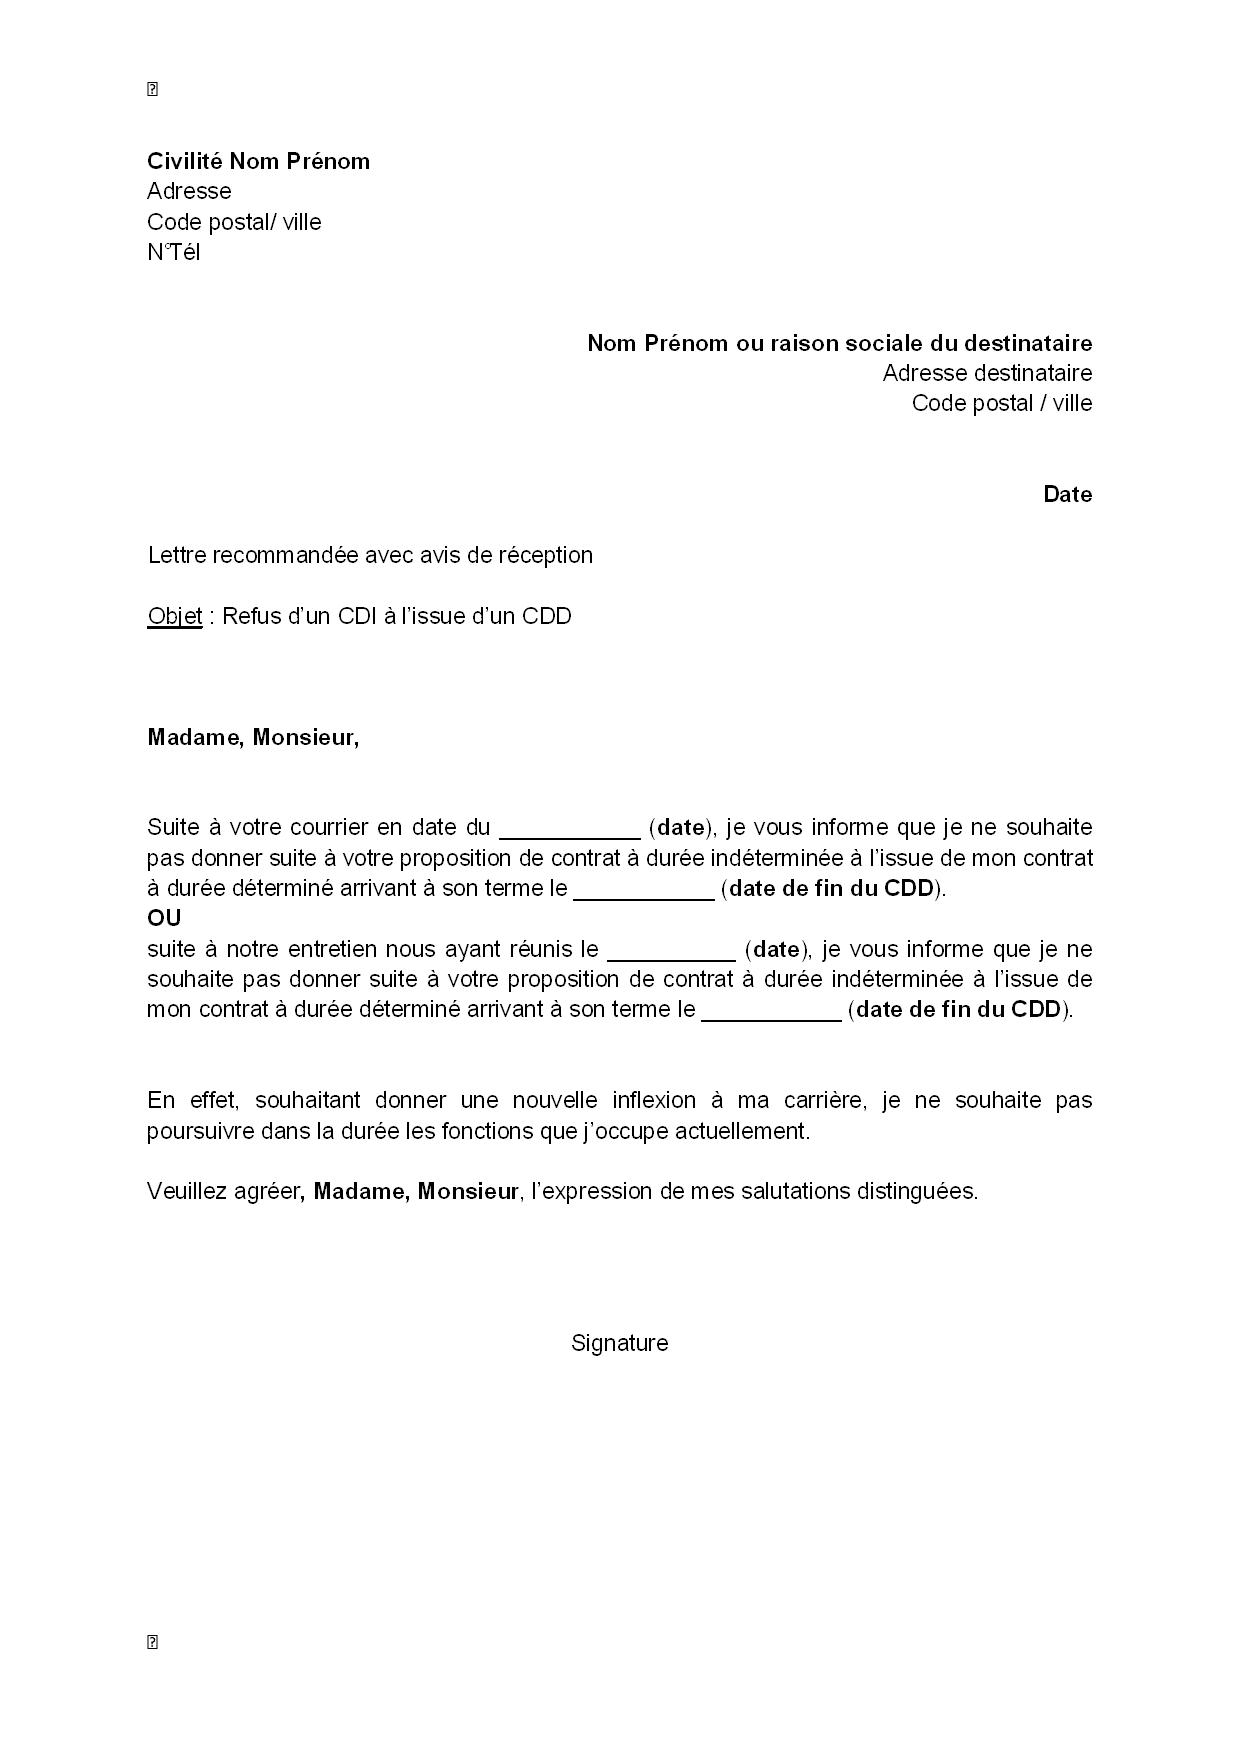 exemple gratuit de lettre refus  par salari u00e9  un cdi  u00e0 issue cdd